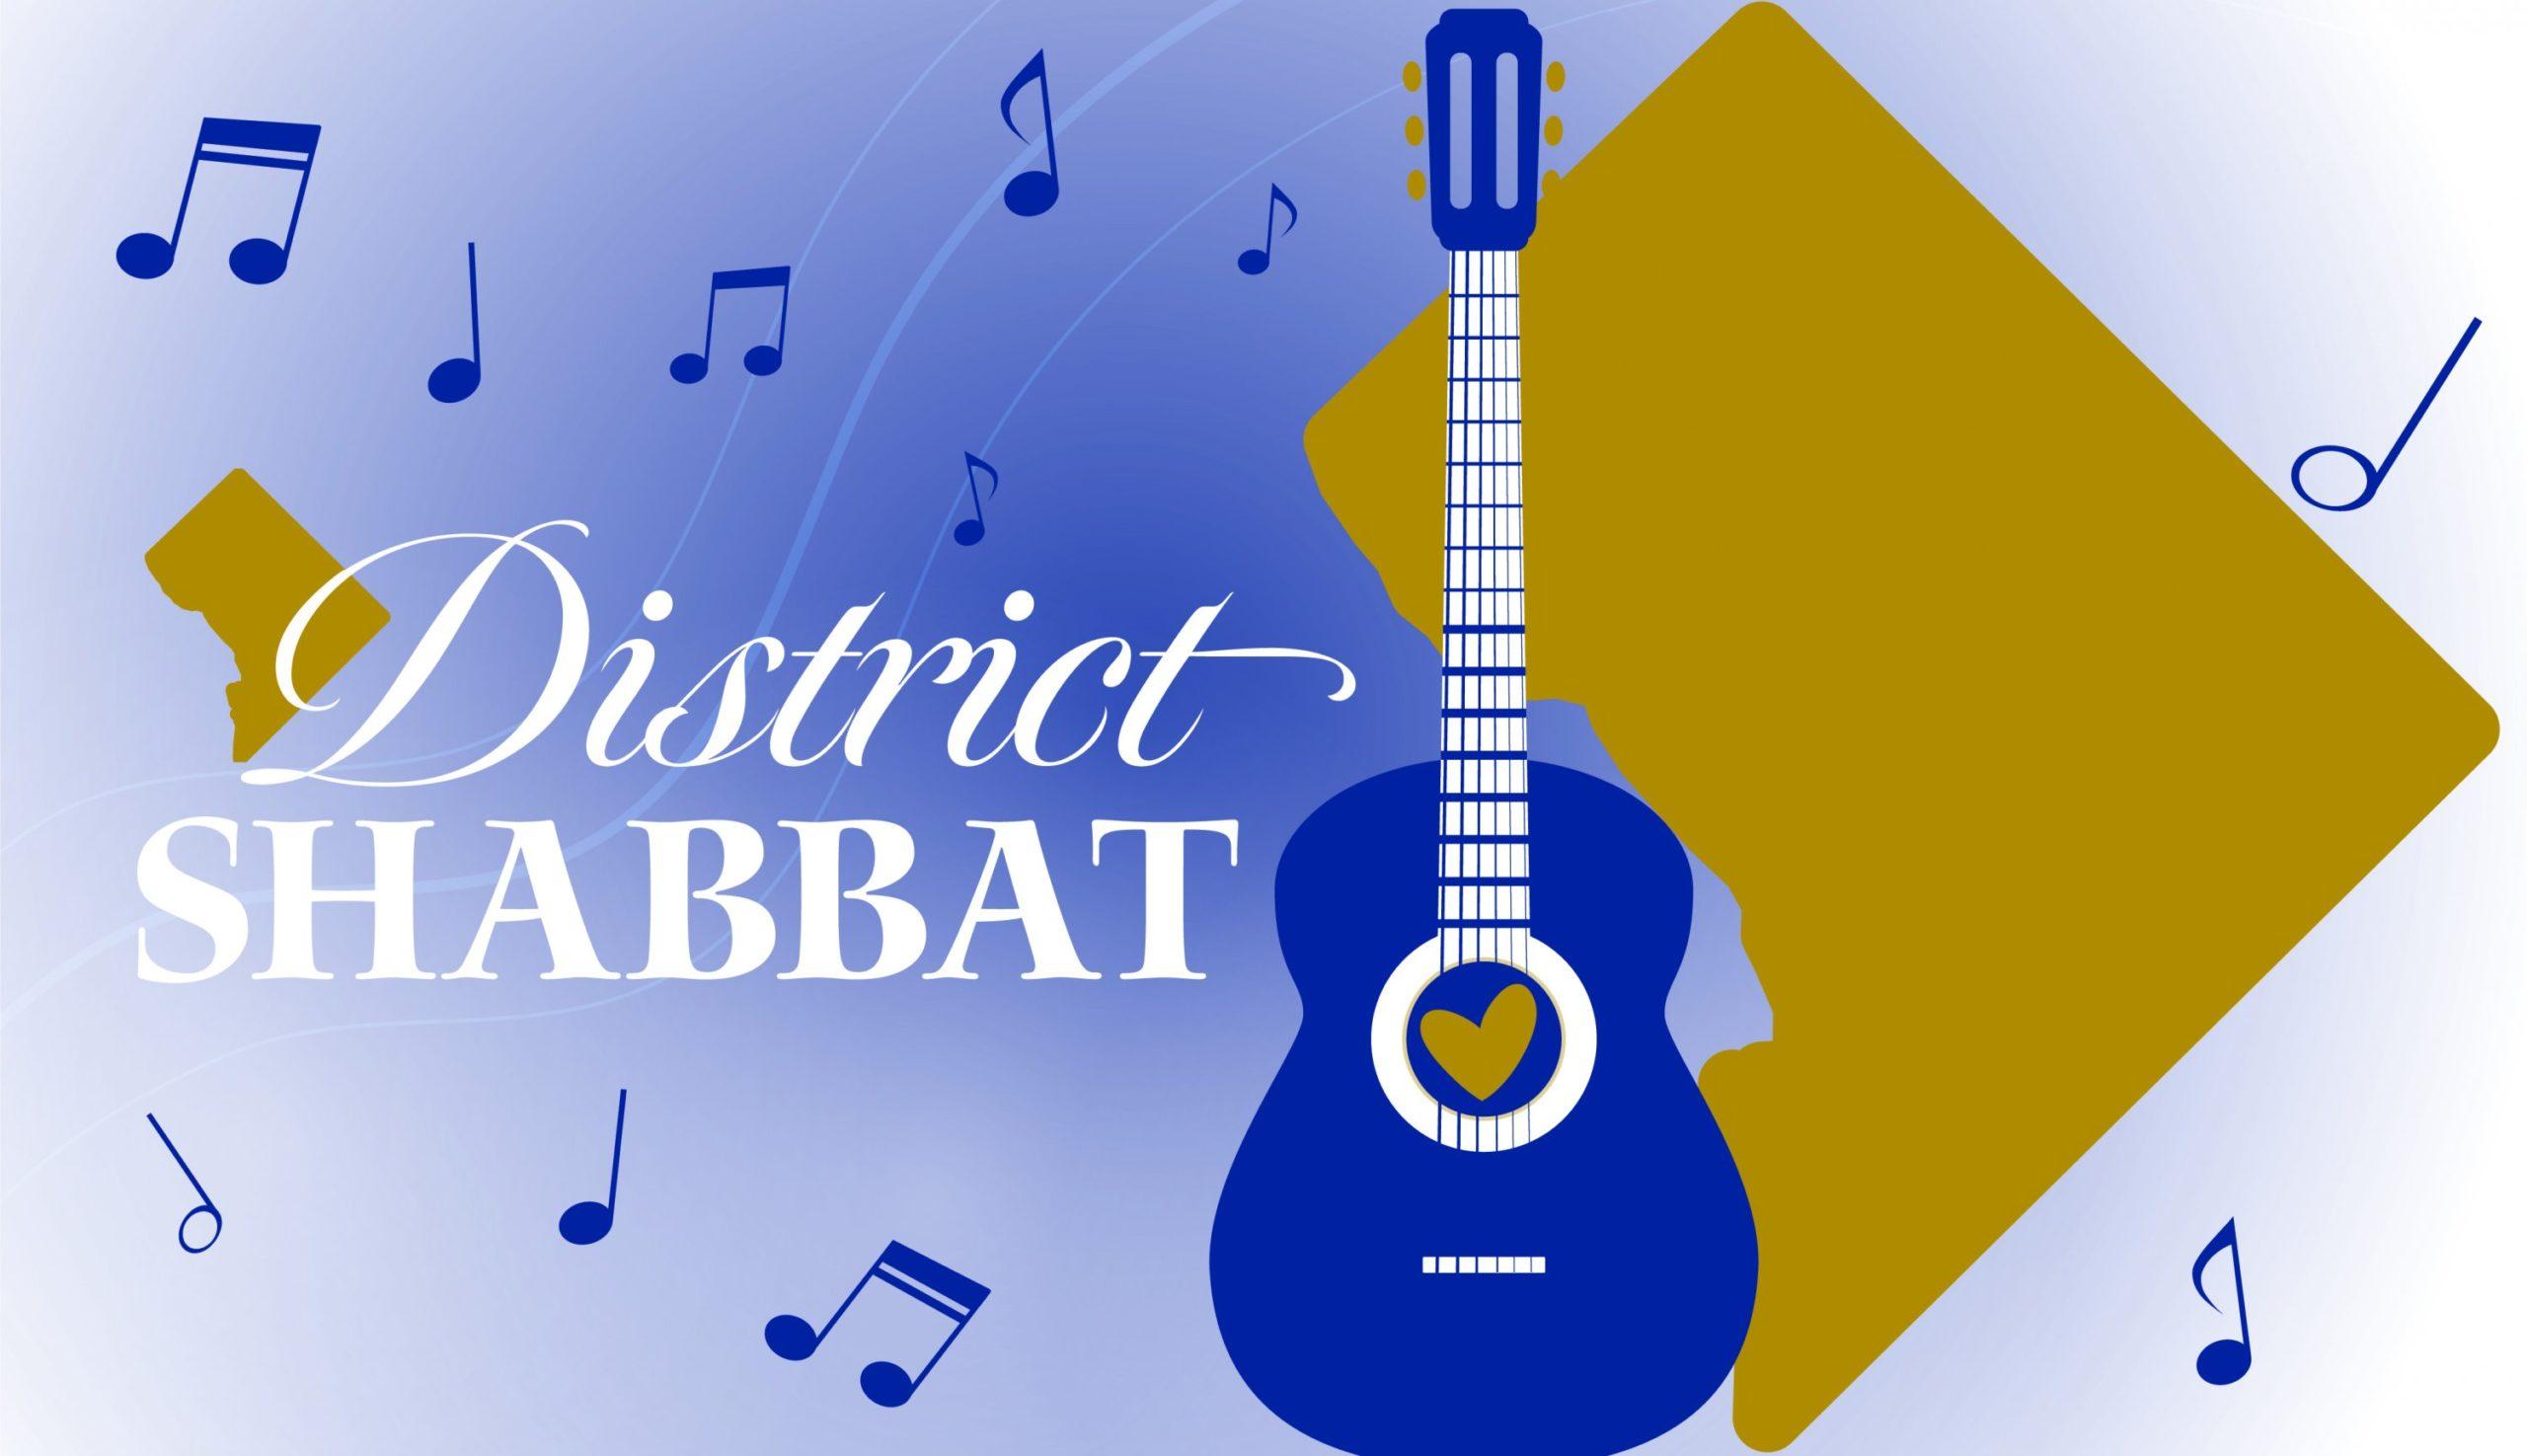 District Shabbat: Judaism Returns to Southwest DC